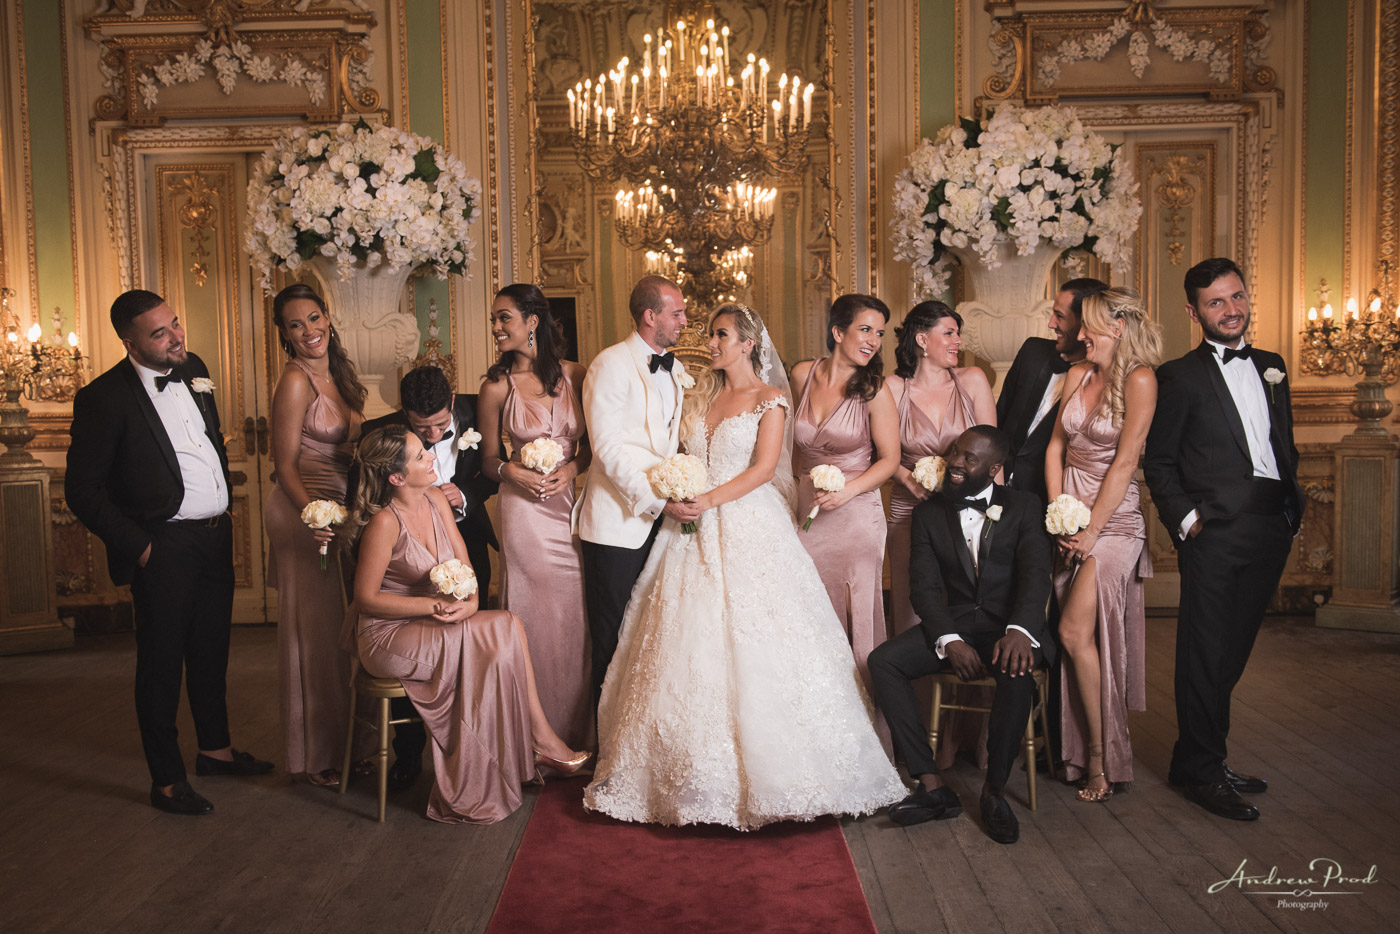 Palazzo Parisio weddings